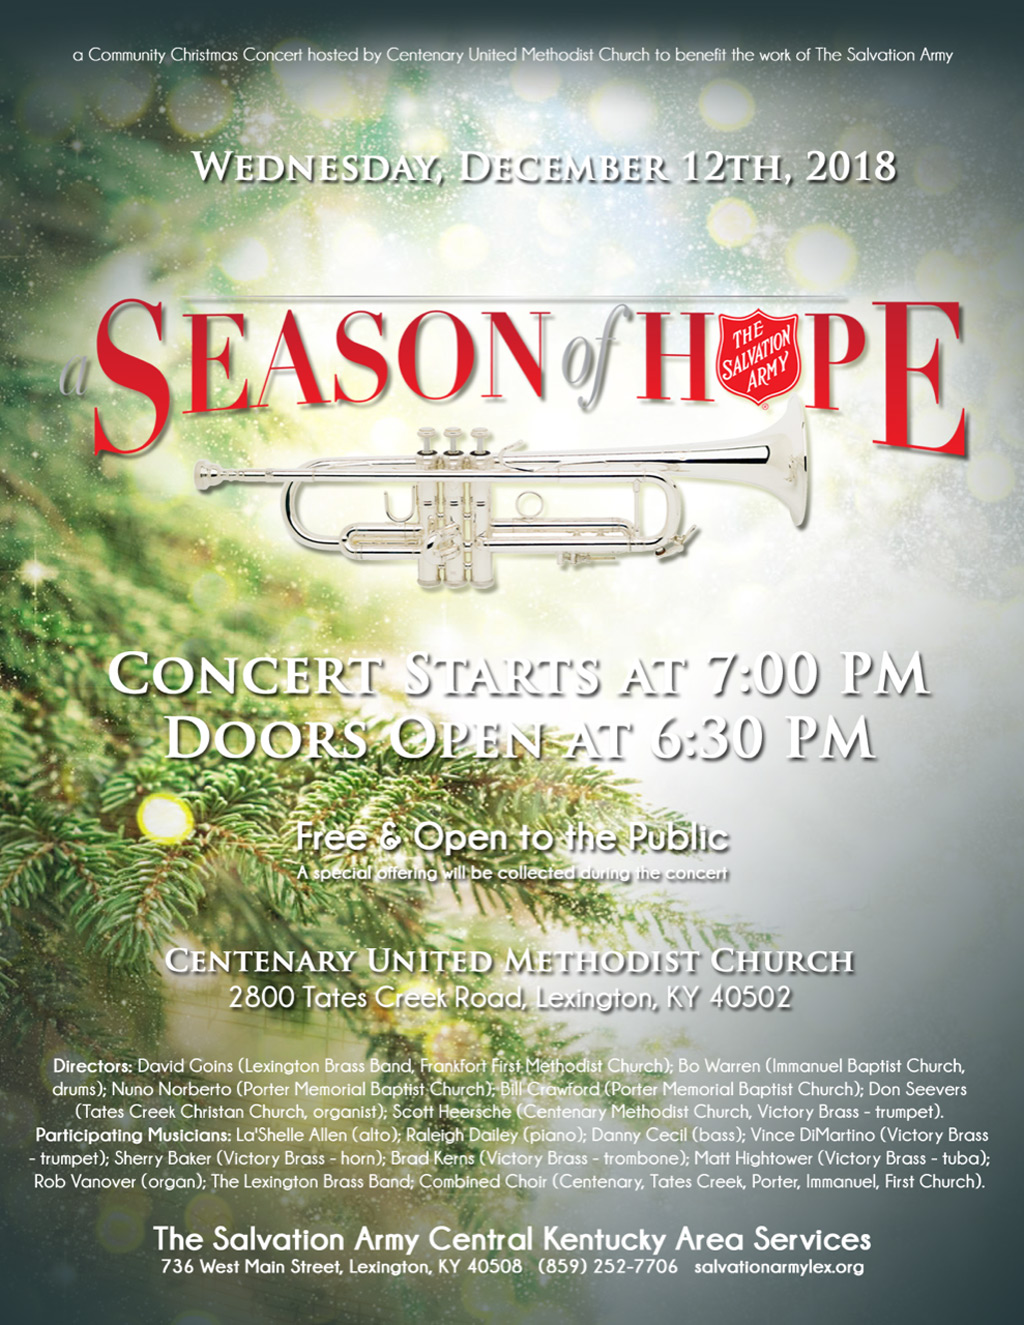 Salvation Army Season of Hope Christmas Concert